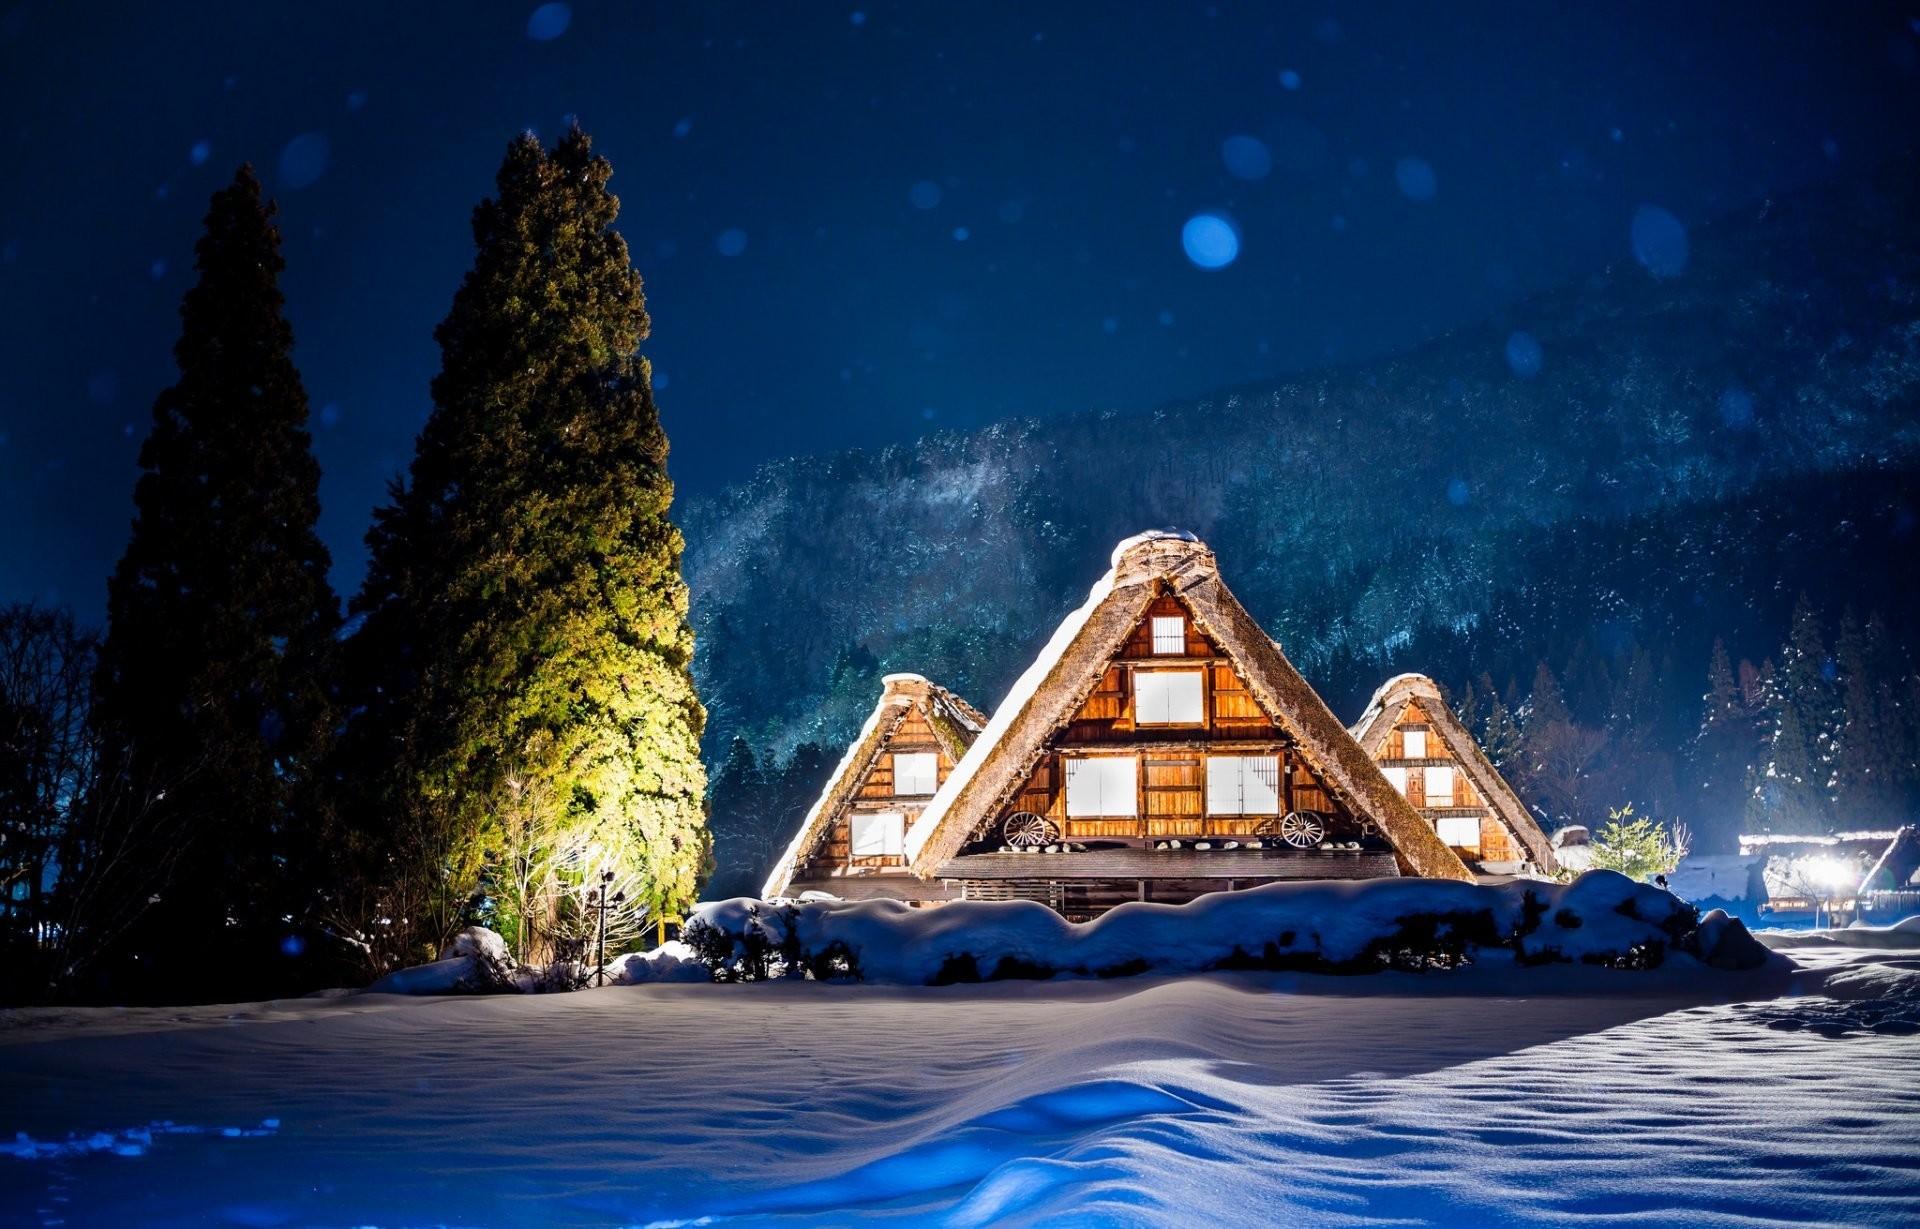 japan night lights house tree mountain winter snow highlight